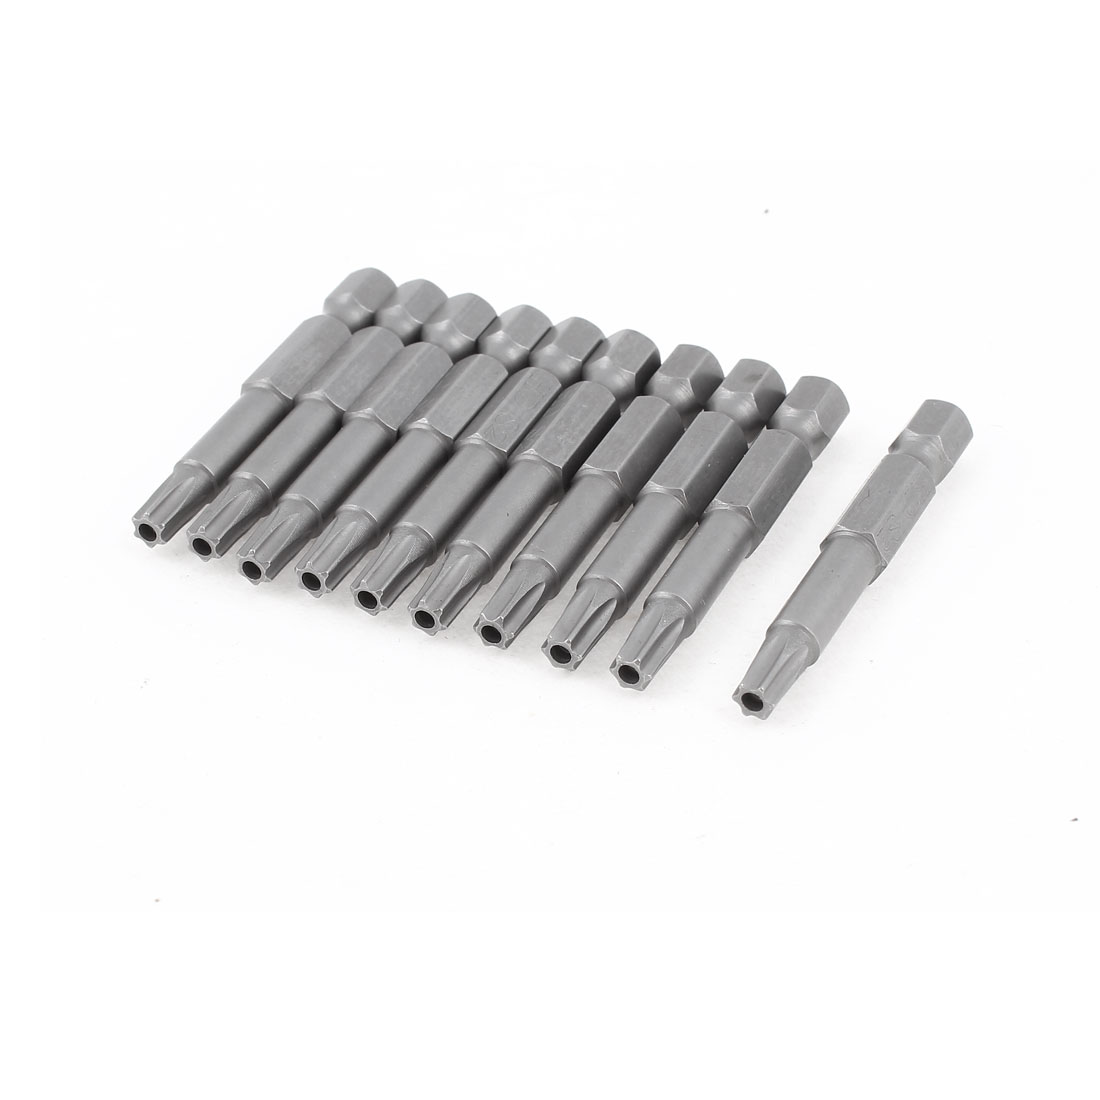 10 Pcs 50mm Long 4mm TT25 Tip Magnetic Torx Screwdriver Bits Gray